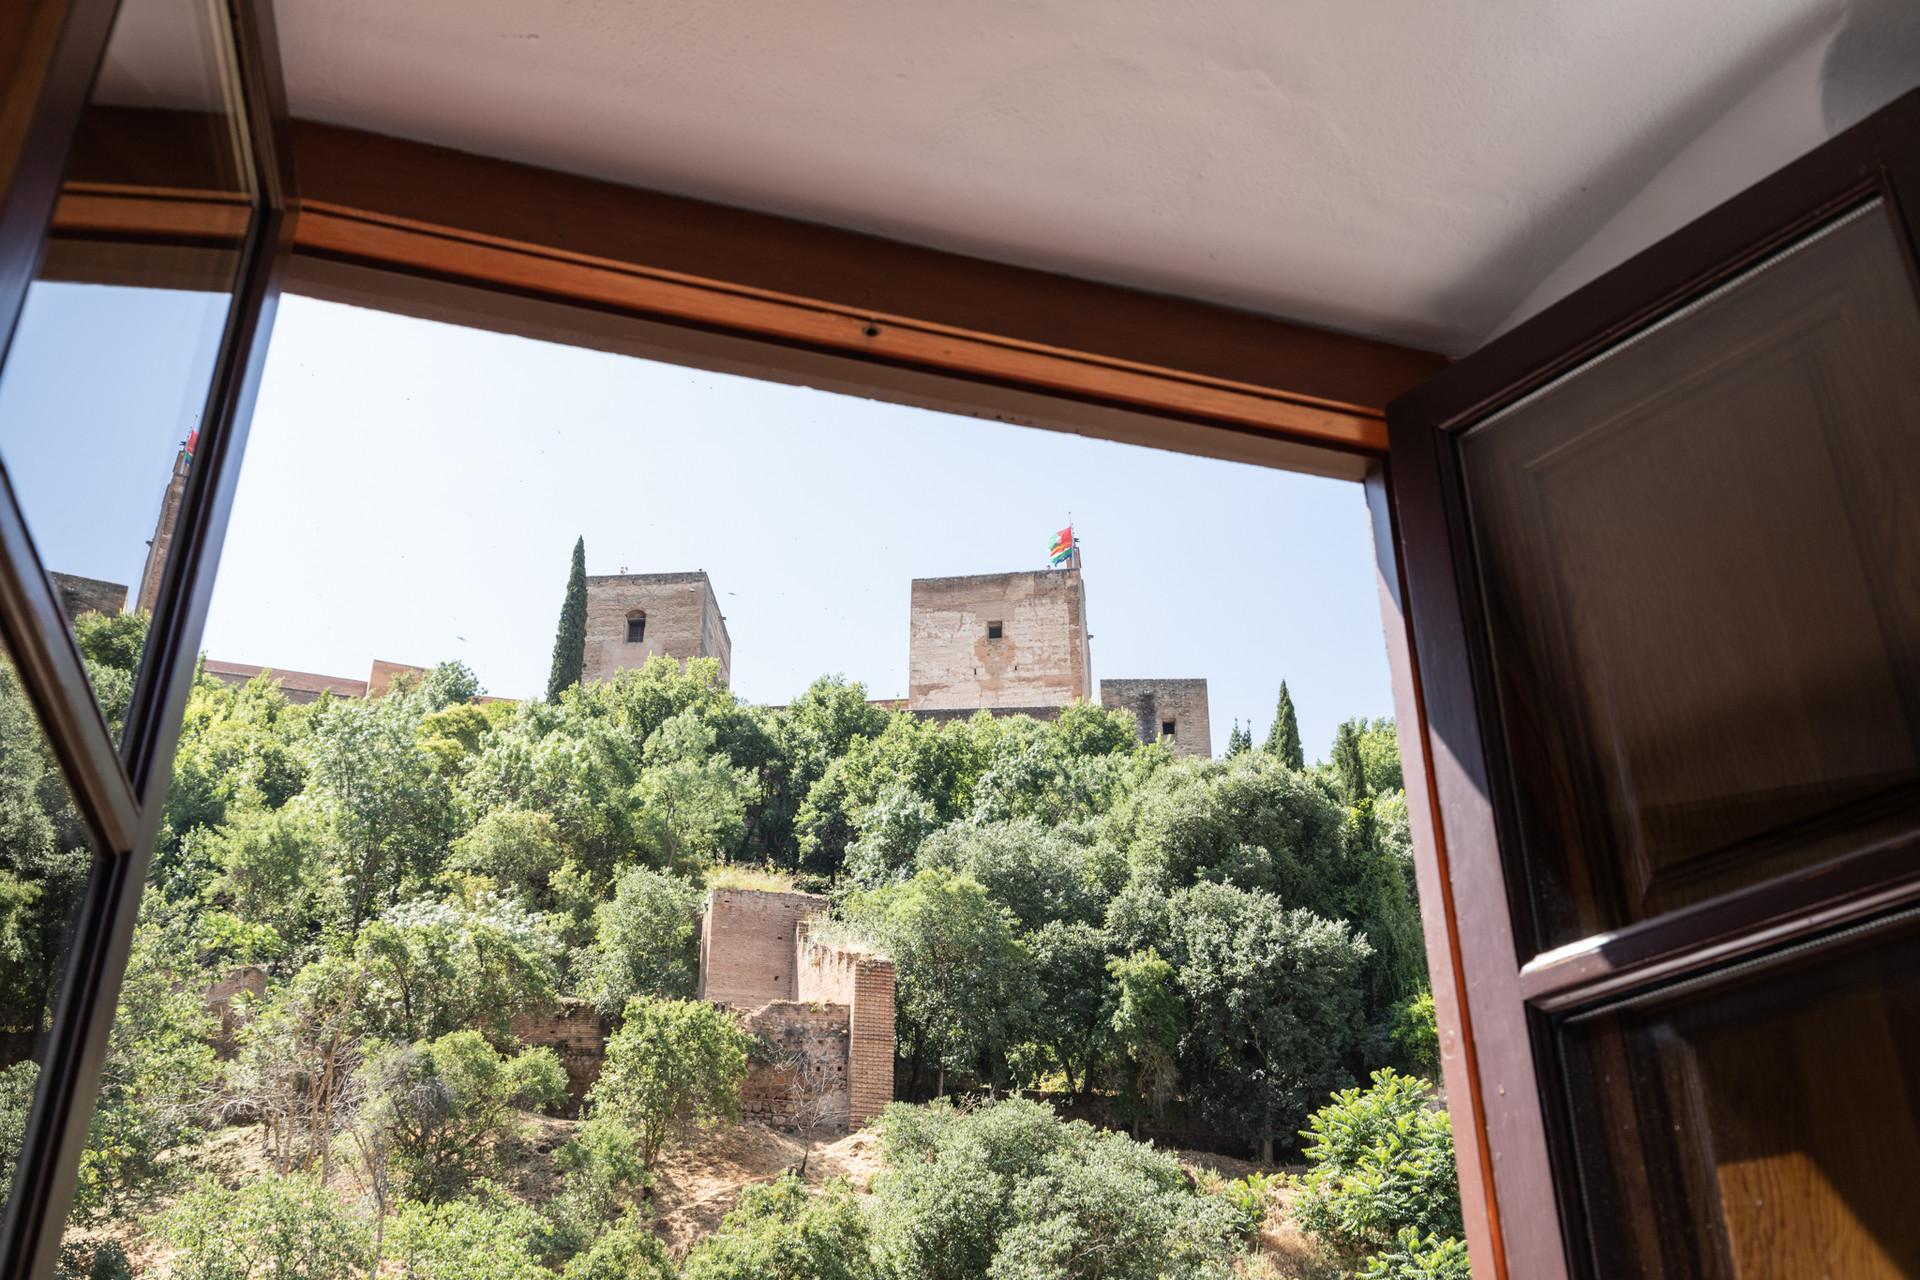 apartment-direct-alhambra-views-7182cae7cc36cbca1bee363003ab0e4b